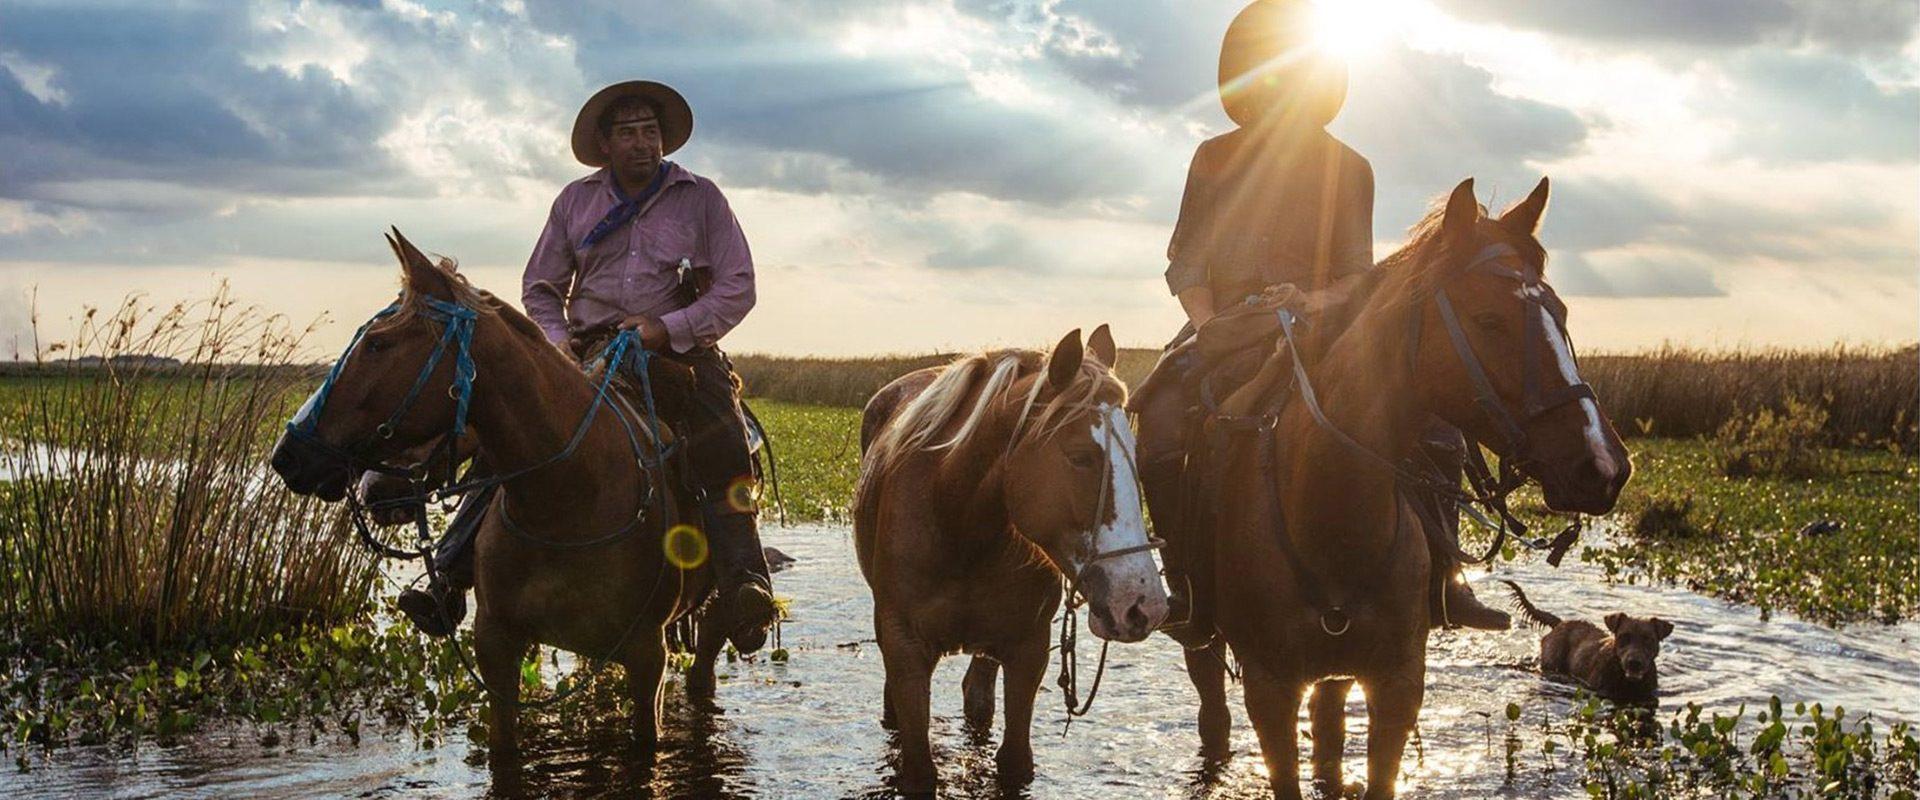 argentine corrientes chevaux patagonie esteros del ibera gauchos